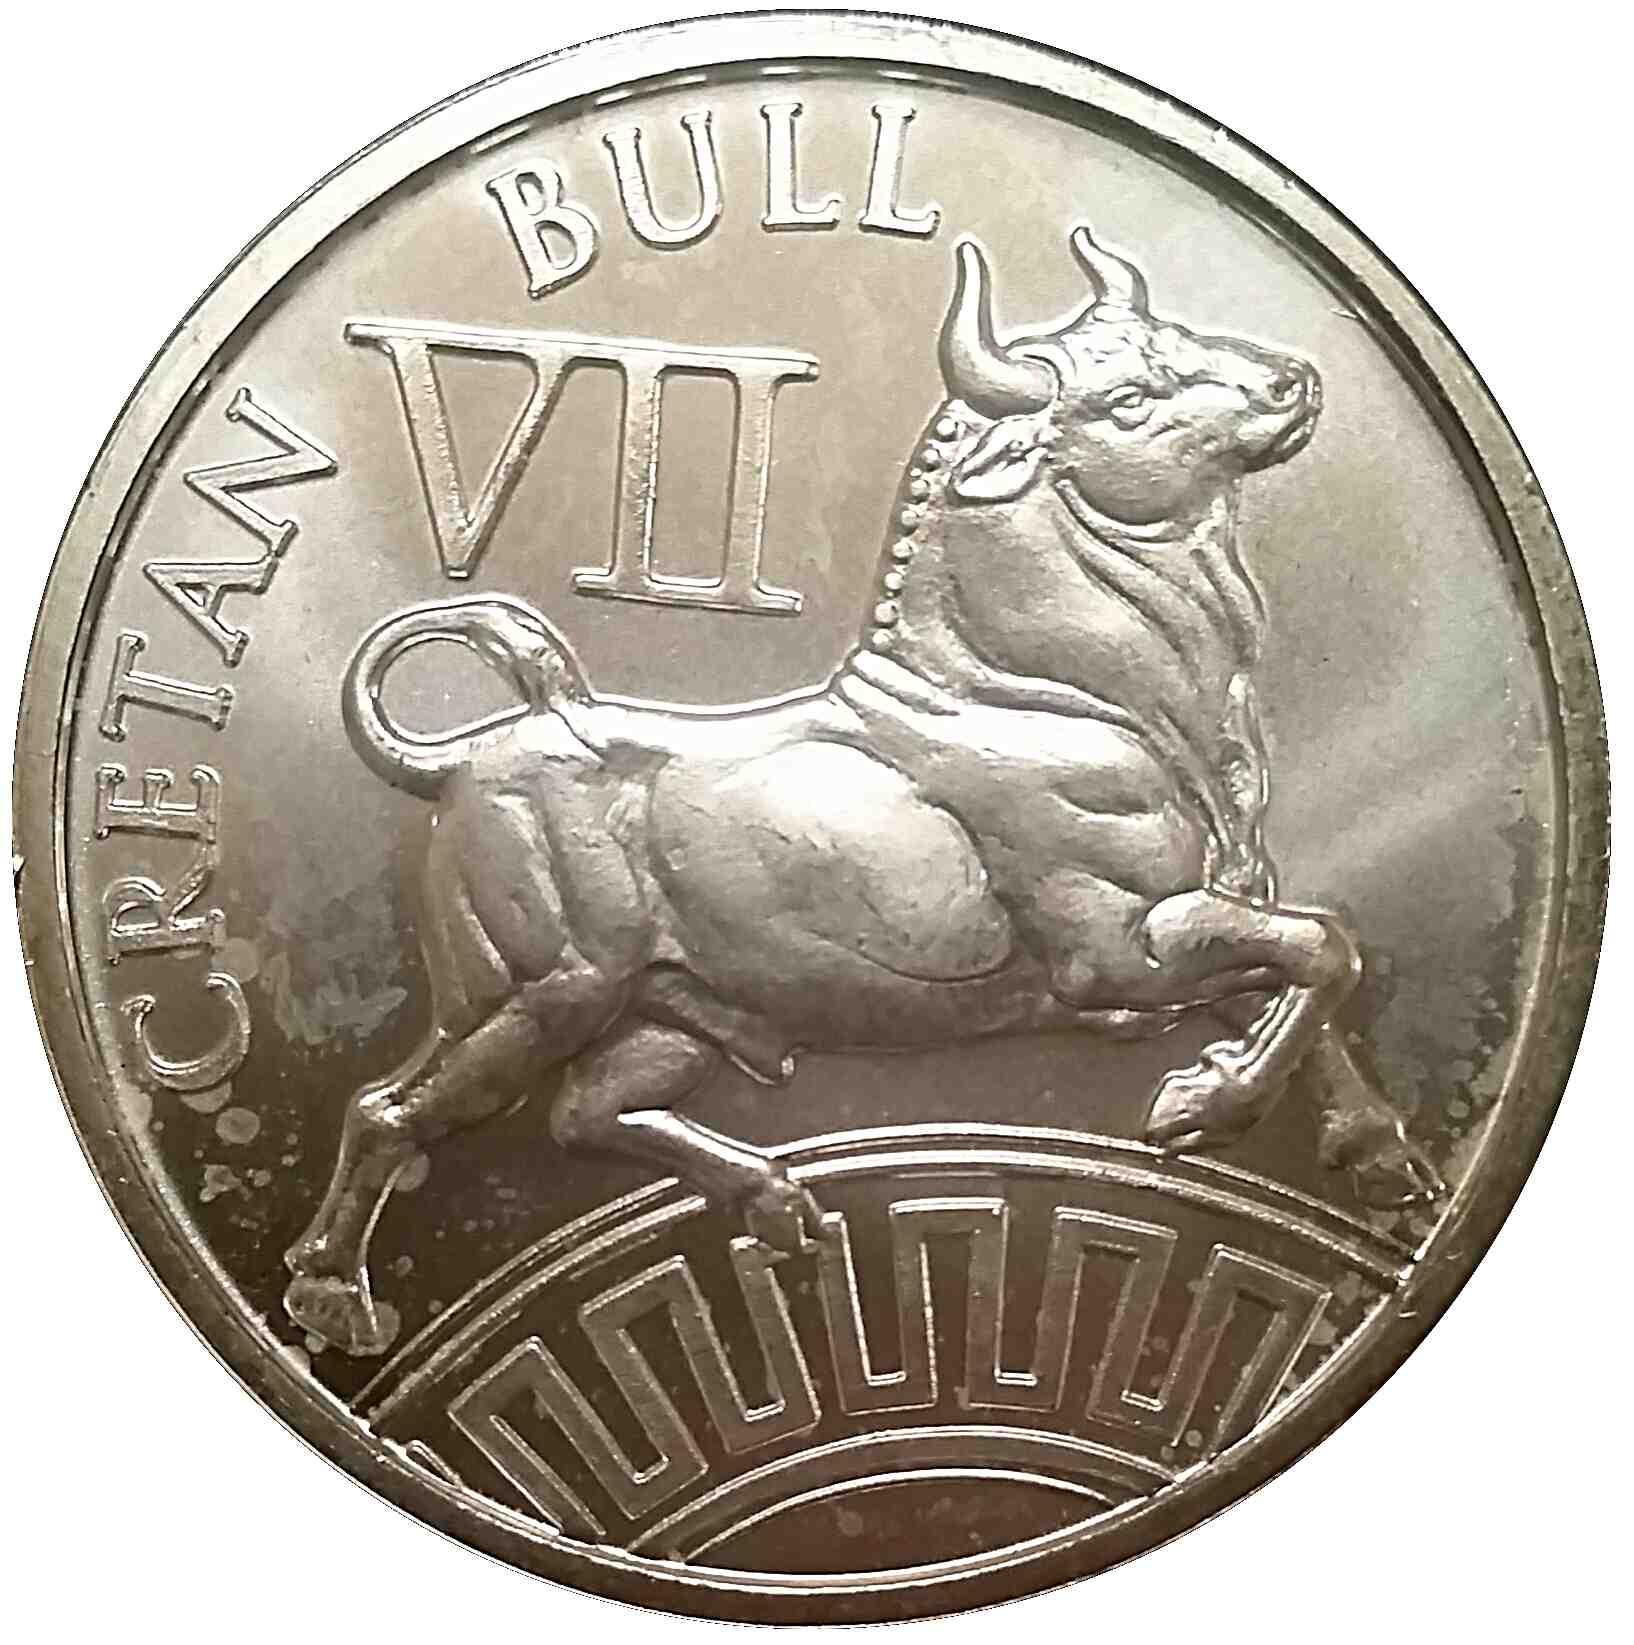 1 Oz Silver Provident Metals The Twelve Labors Of